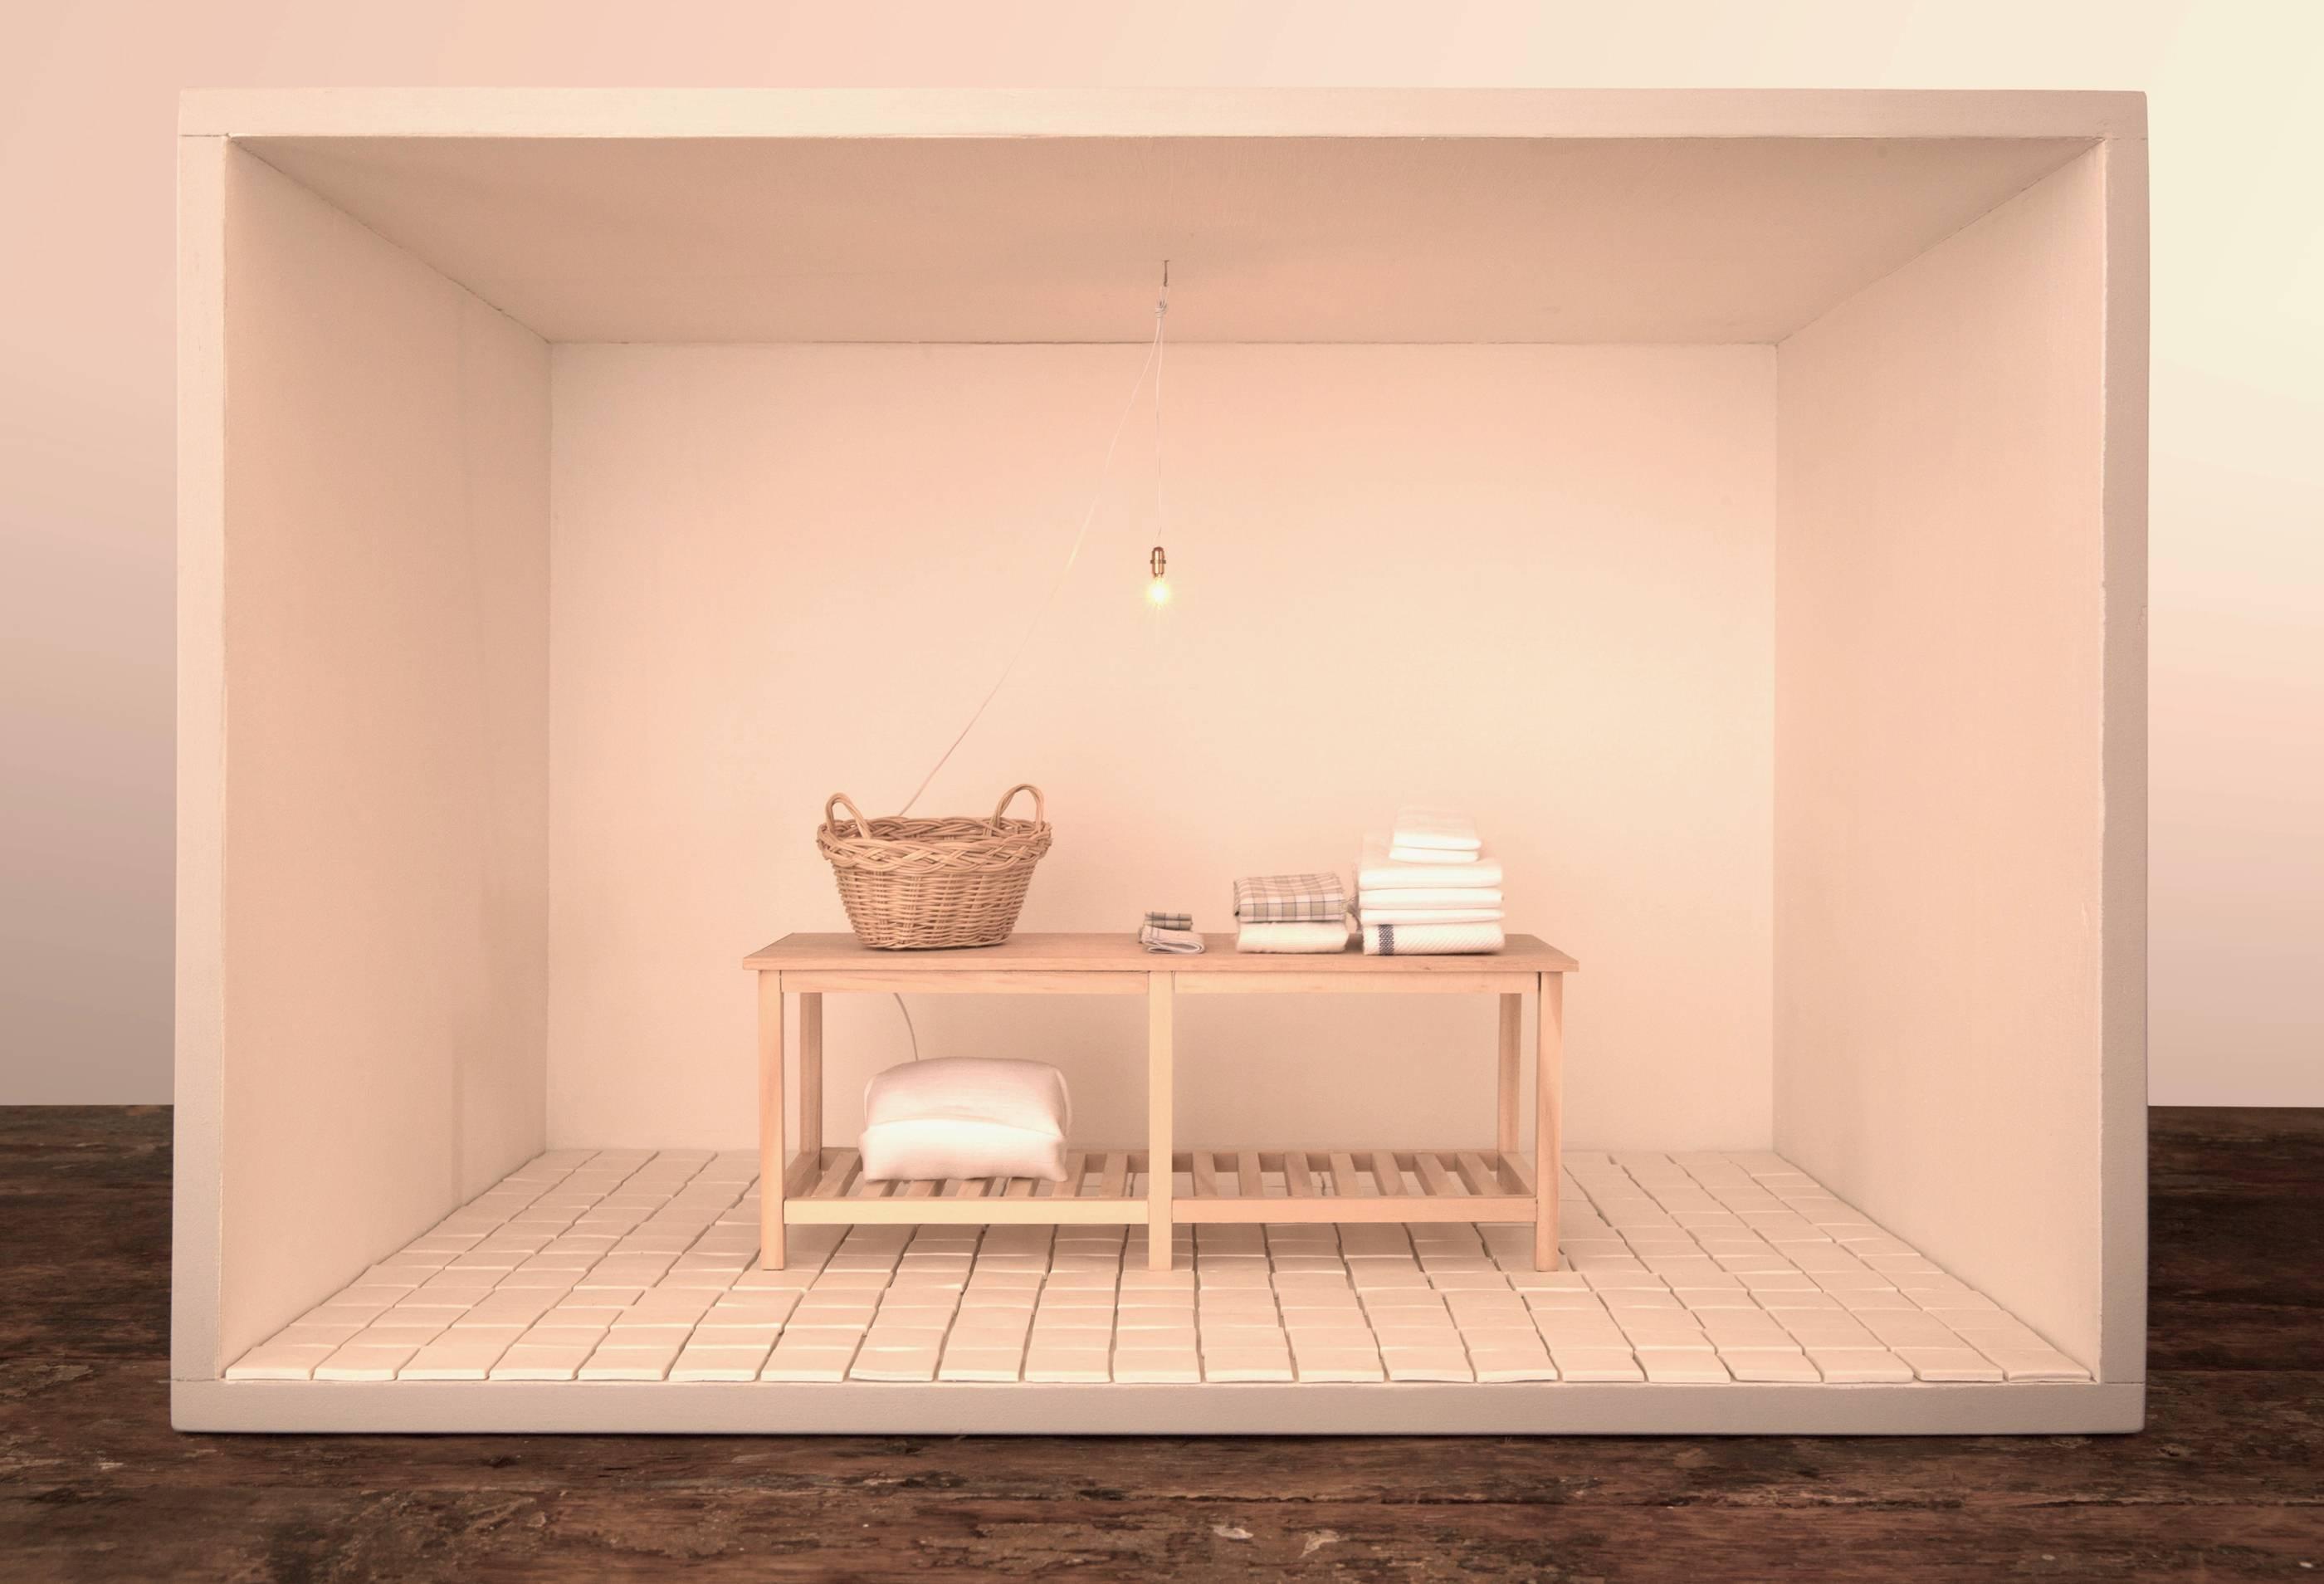 Refuge #4 - contemporary color photograph of interior